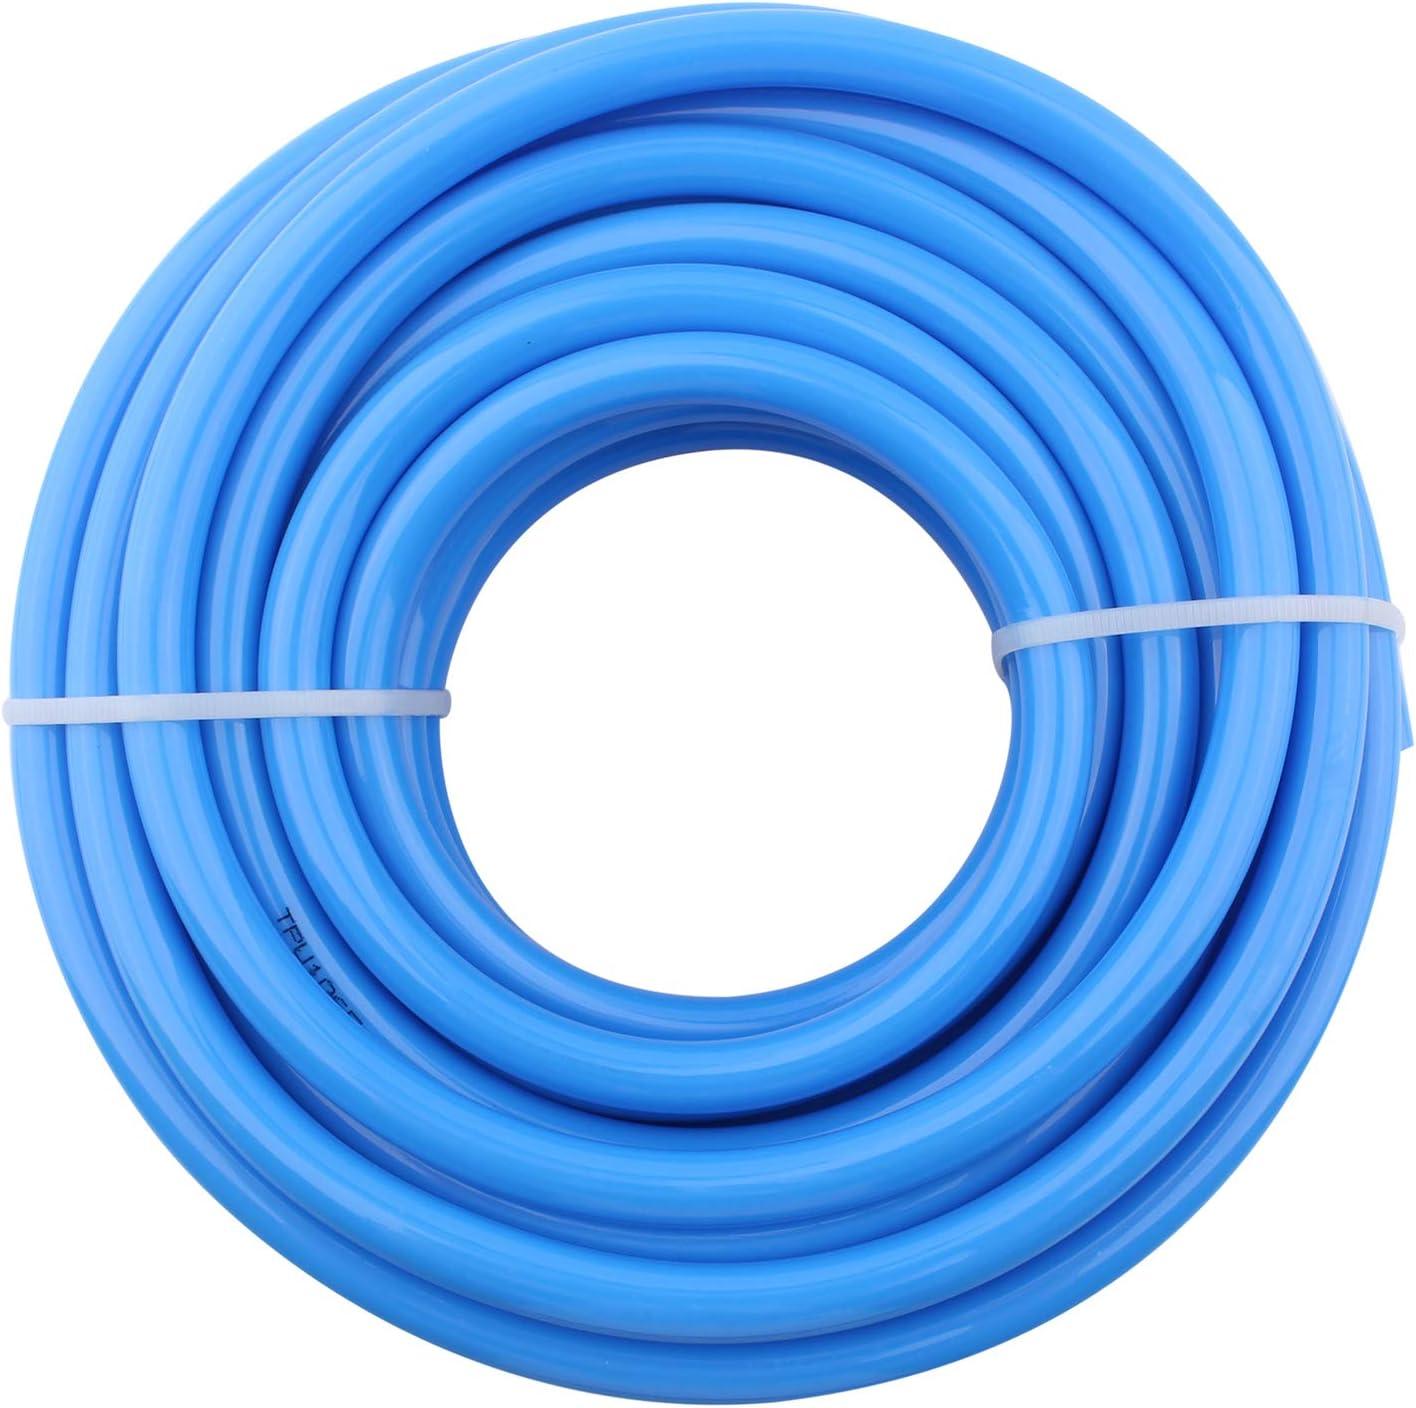 DERPIPE Pneumatic Hose 10mm OD 6.5mm ID Blue Polyurethane PU Tubing Air Compressor Pipe 10Meter (32.8ft)